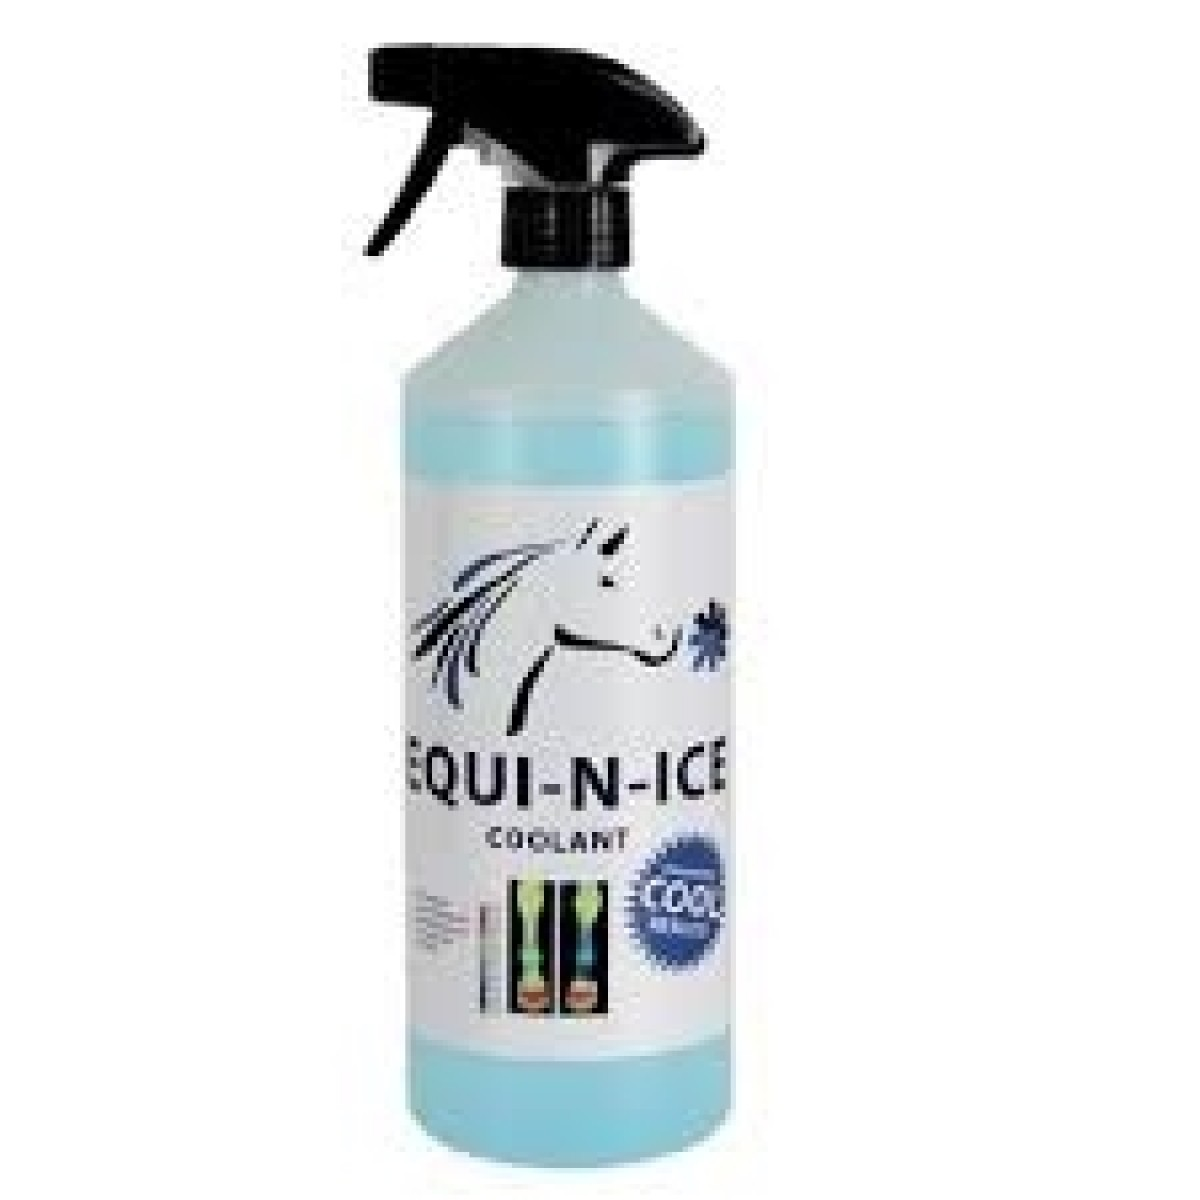 Equi-N-ice Spray Coolant 1L